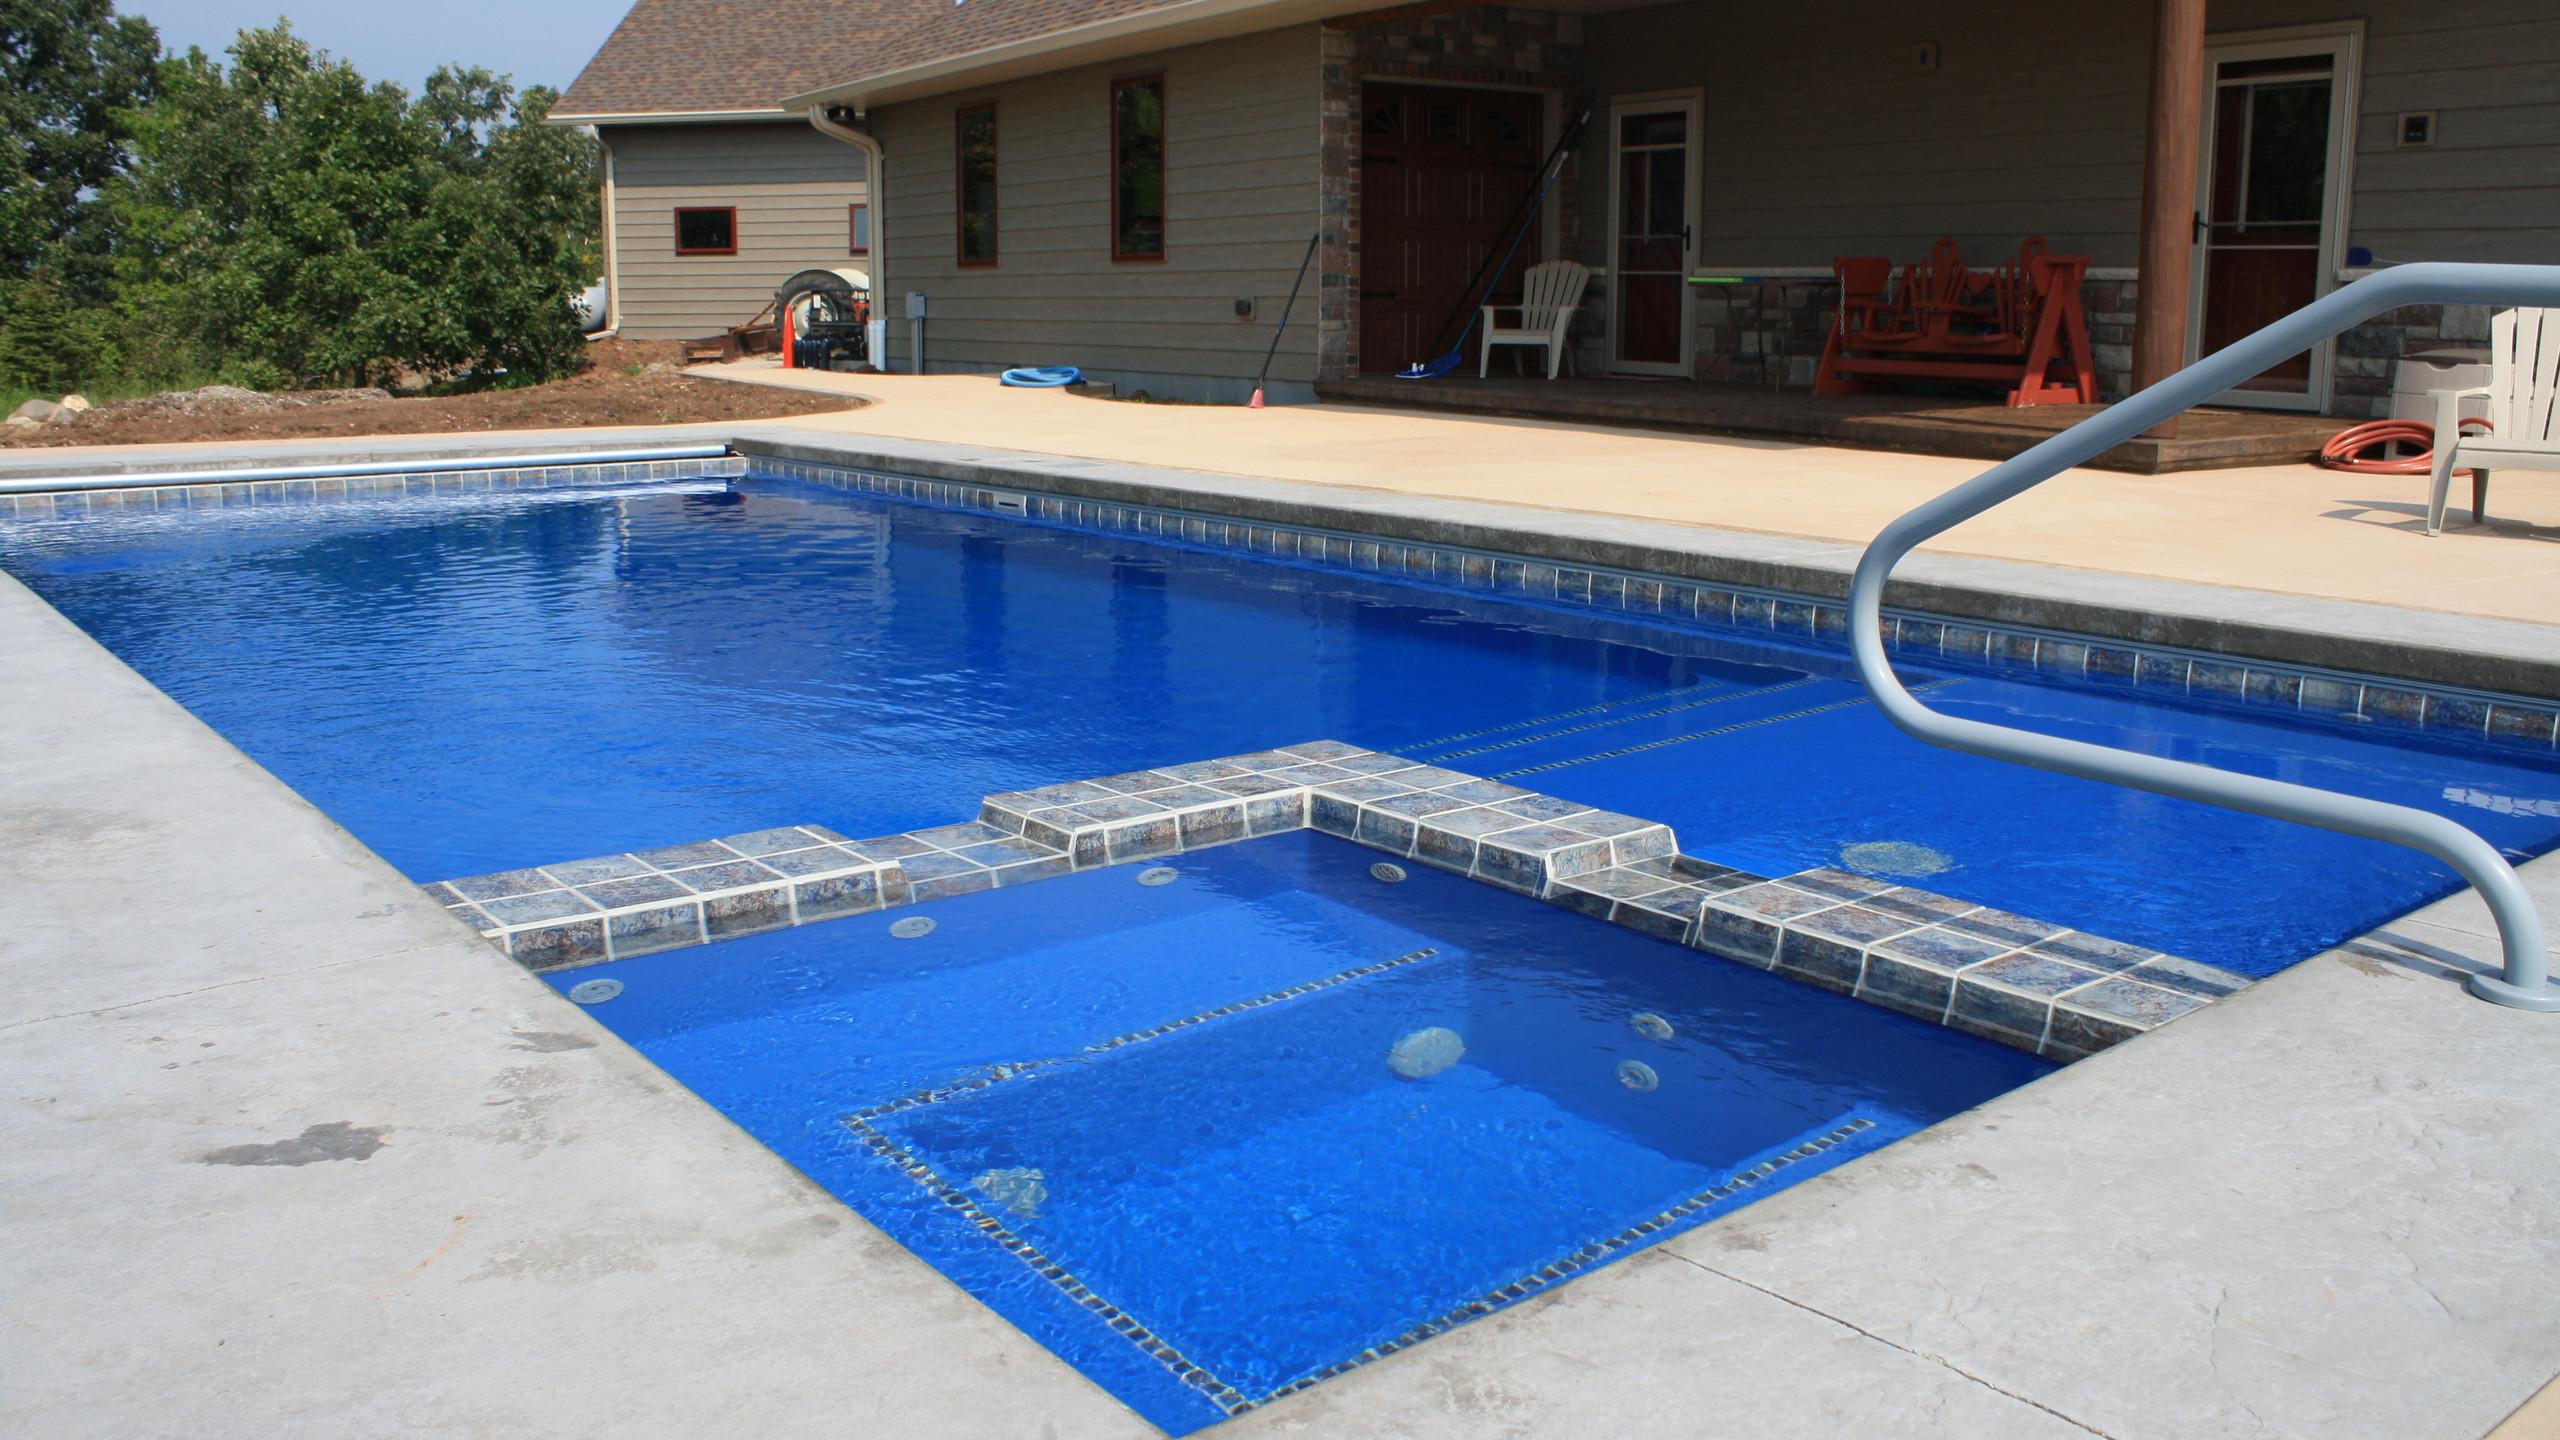 APSP Gold Award for residential fiberglass pool in Larsen WI